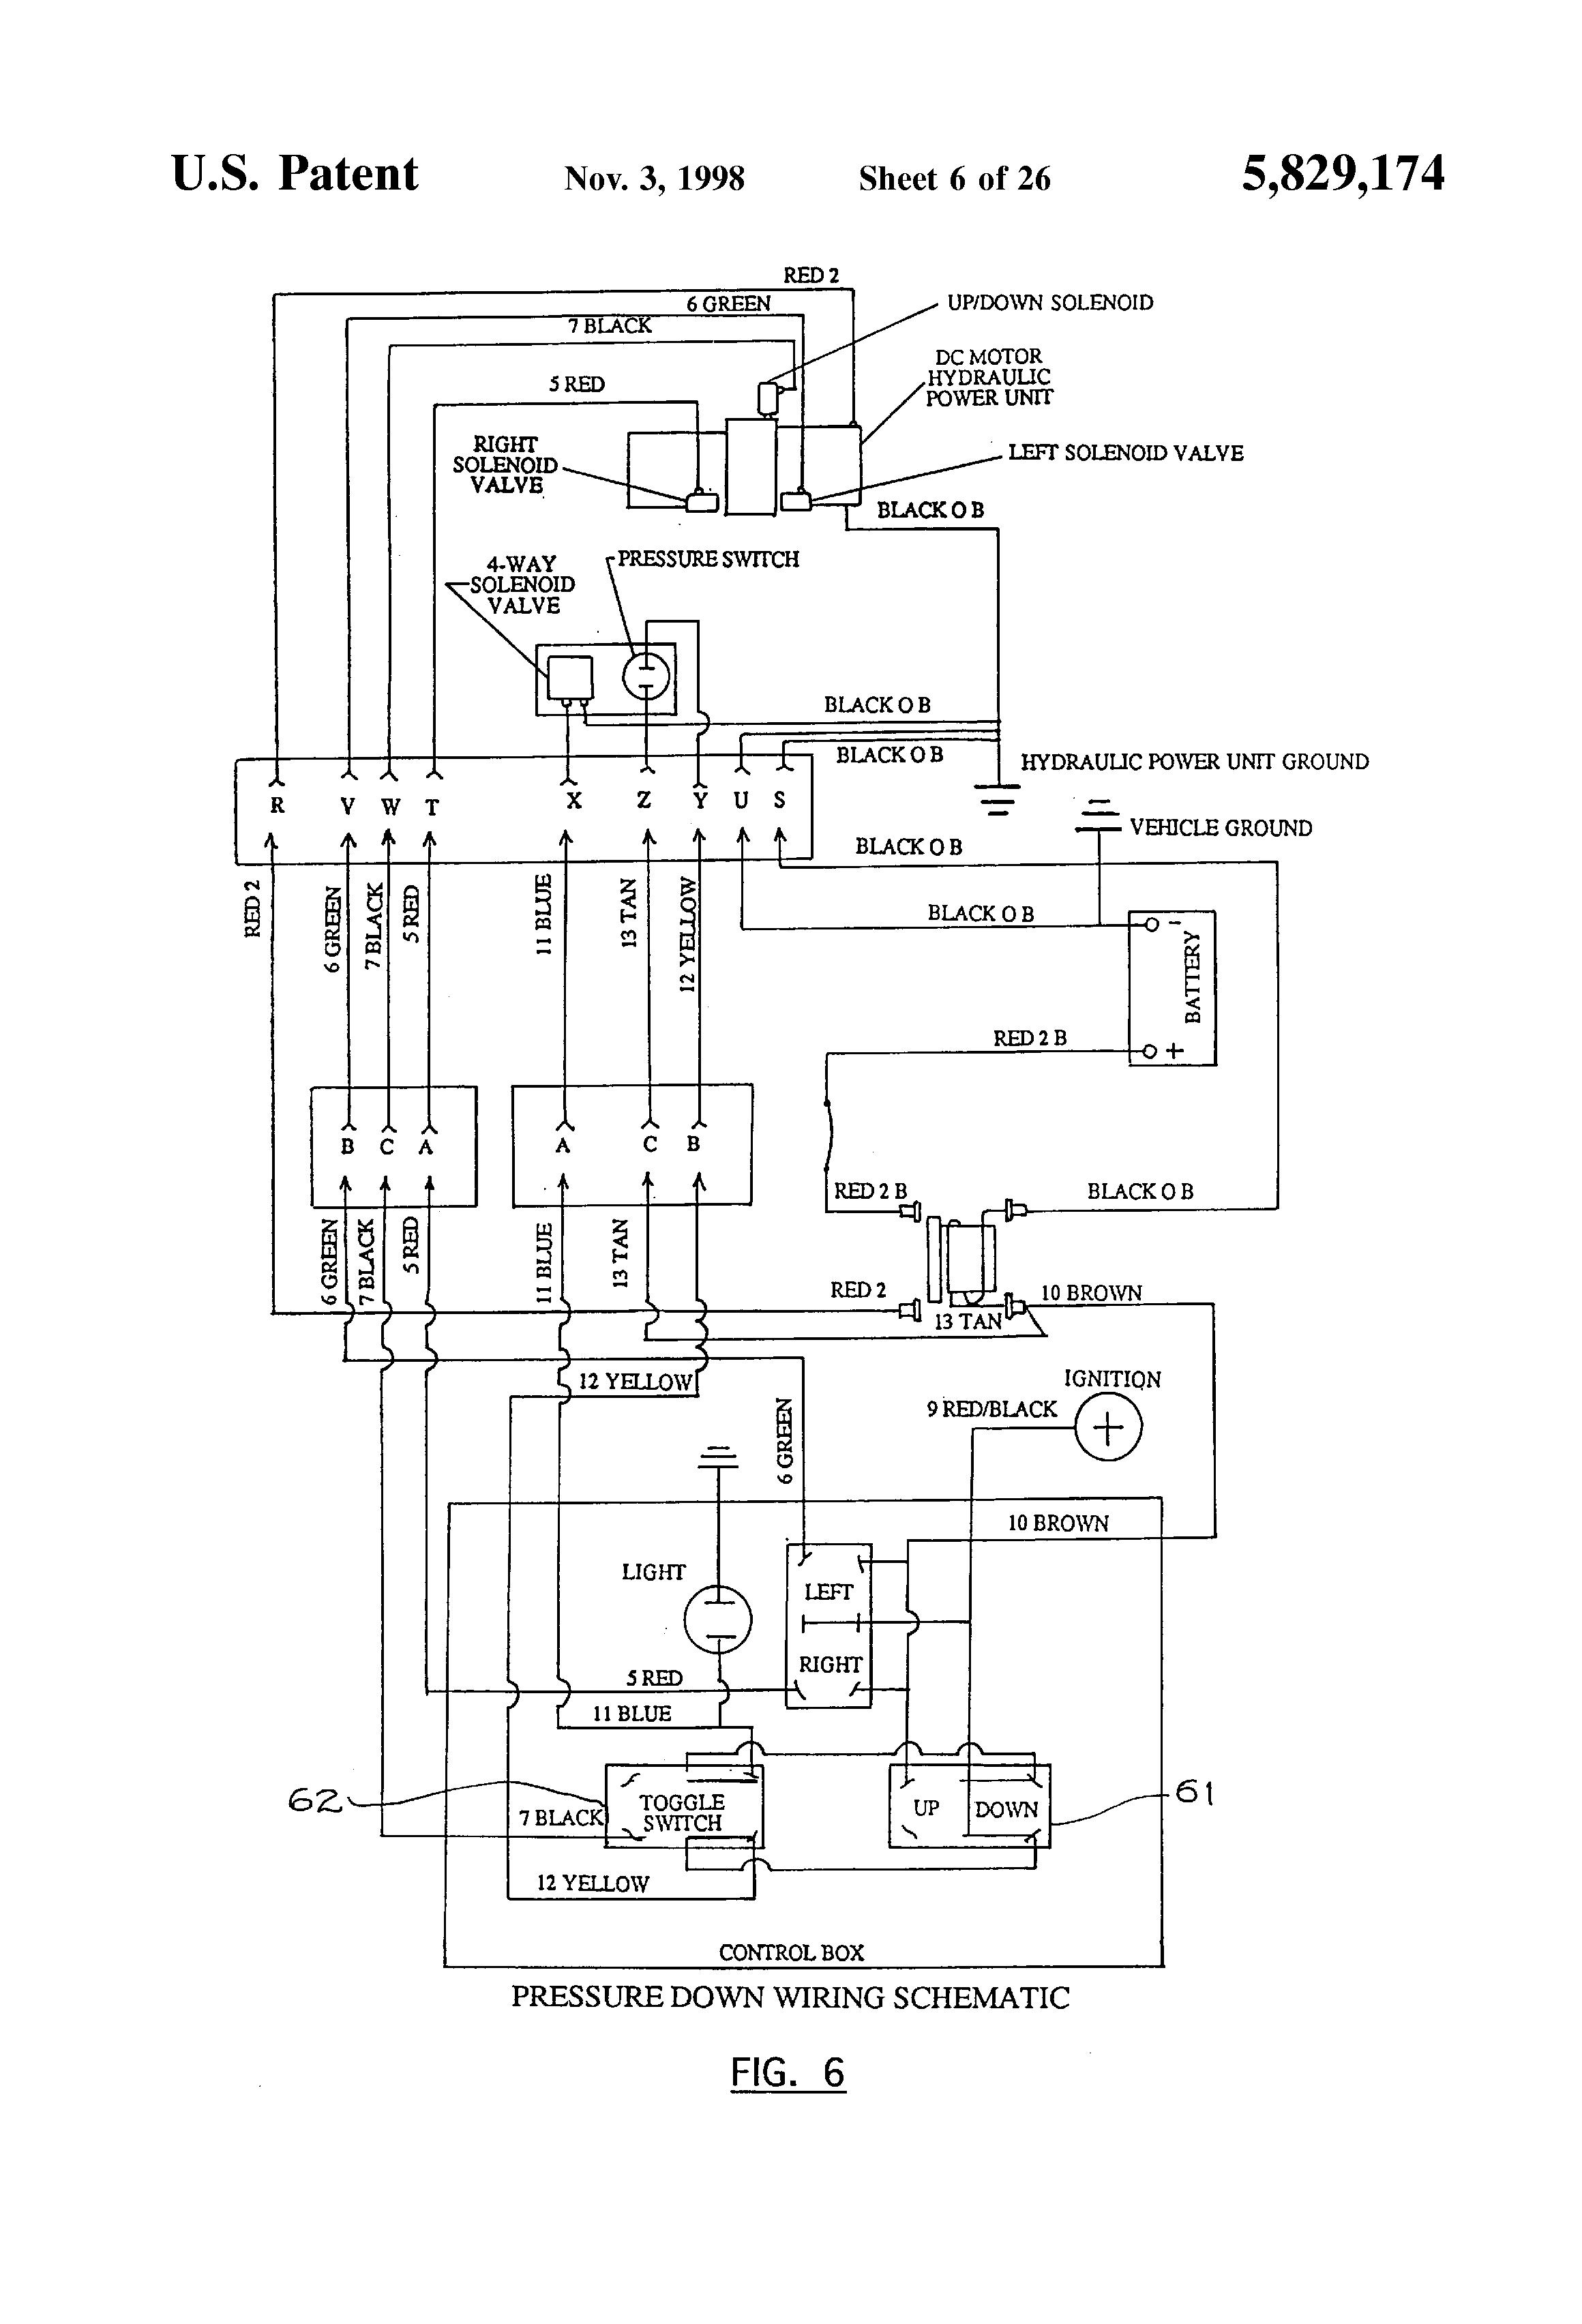 diagram] meyer plow wiring diagram 68 full version hd quality diagram 68 -  v58o.eurolympiques.fr  v58o.eurolympiques.fr